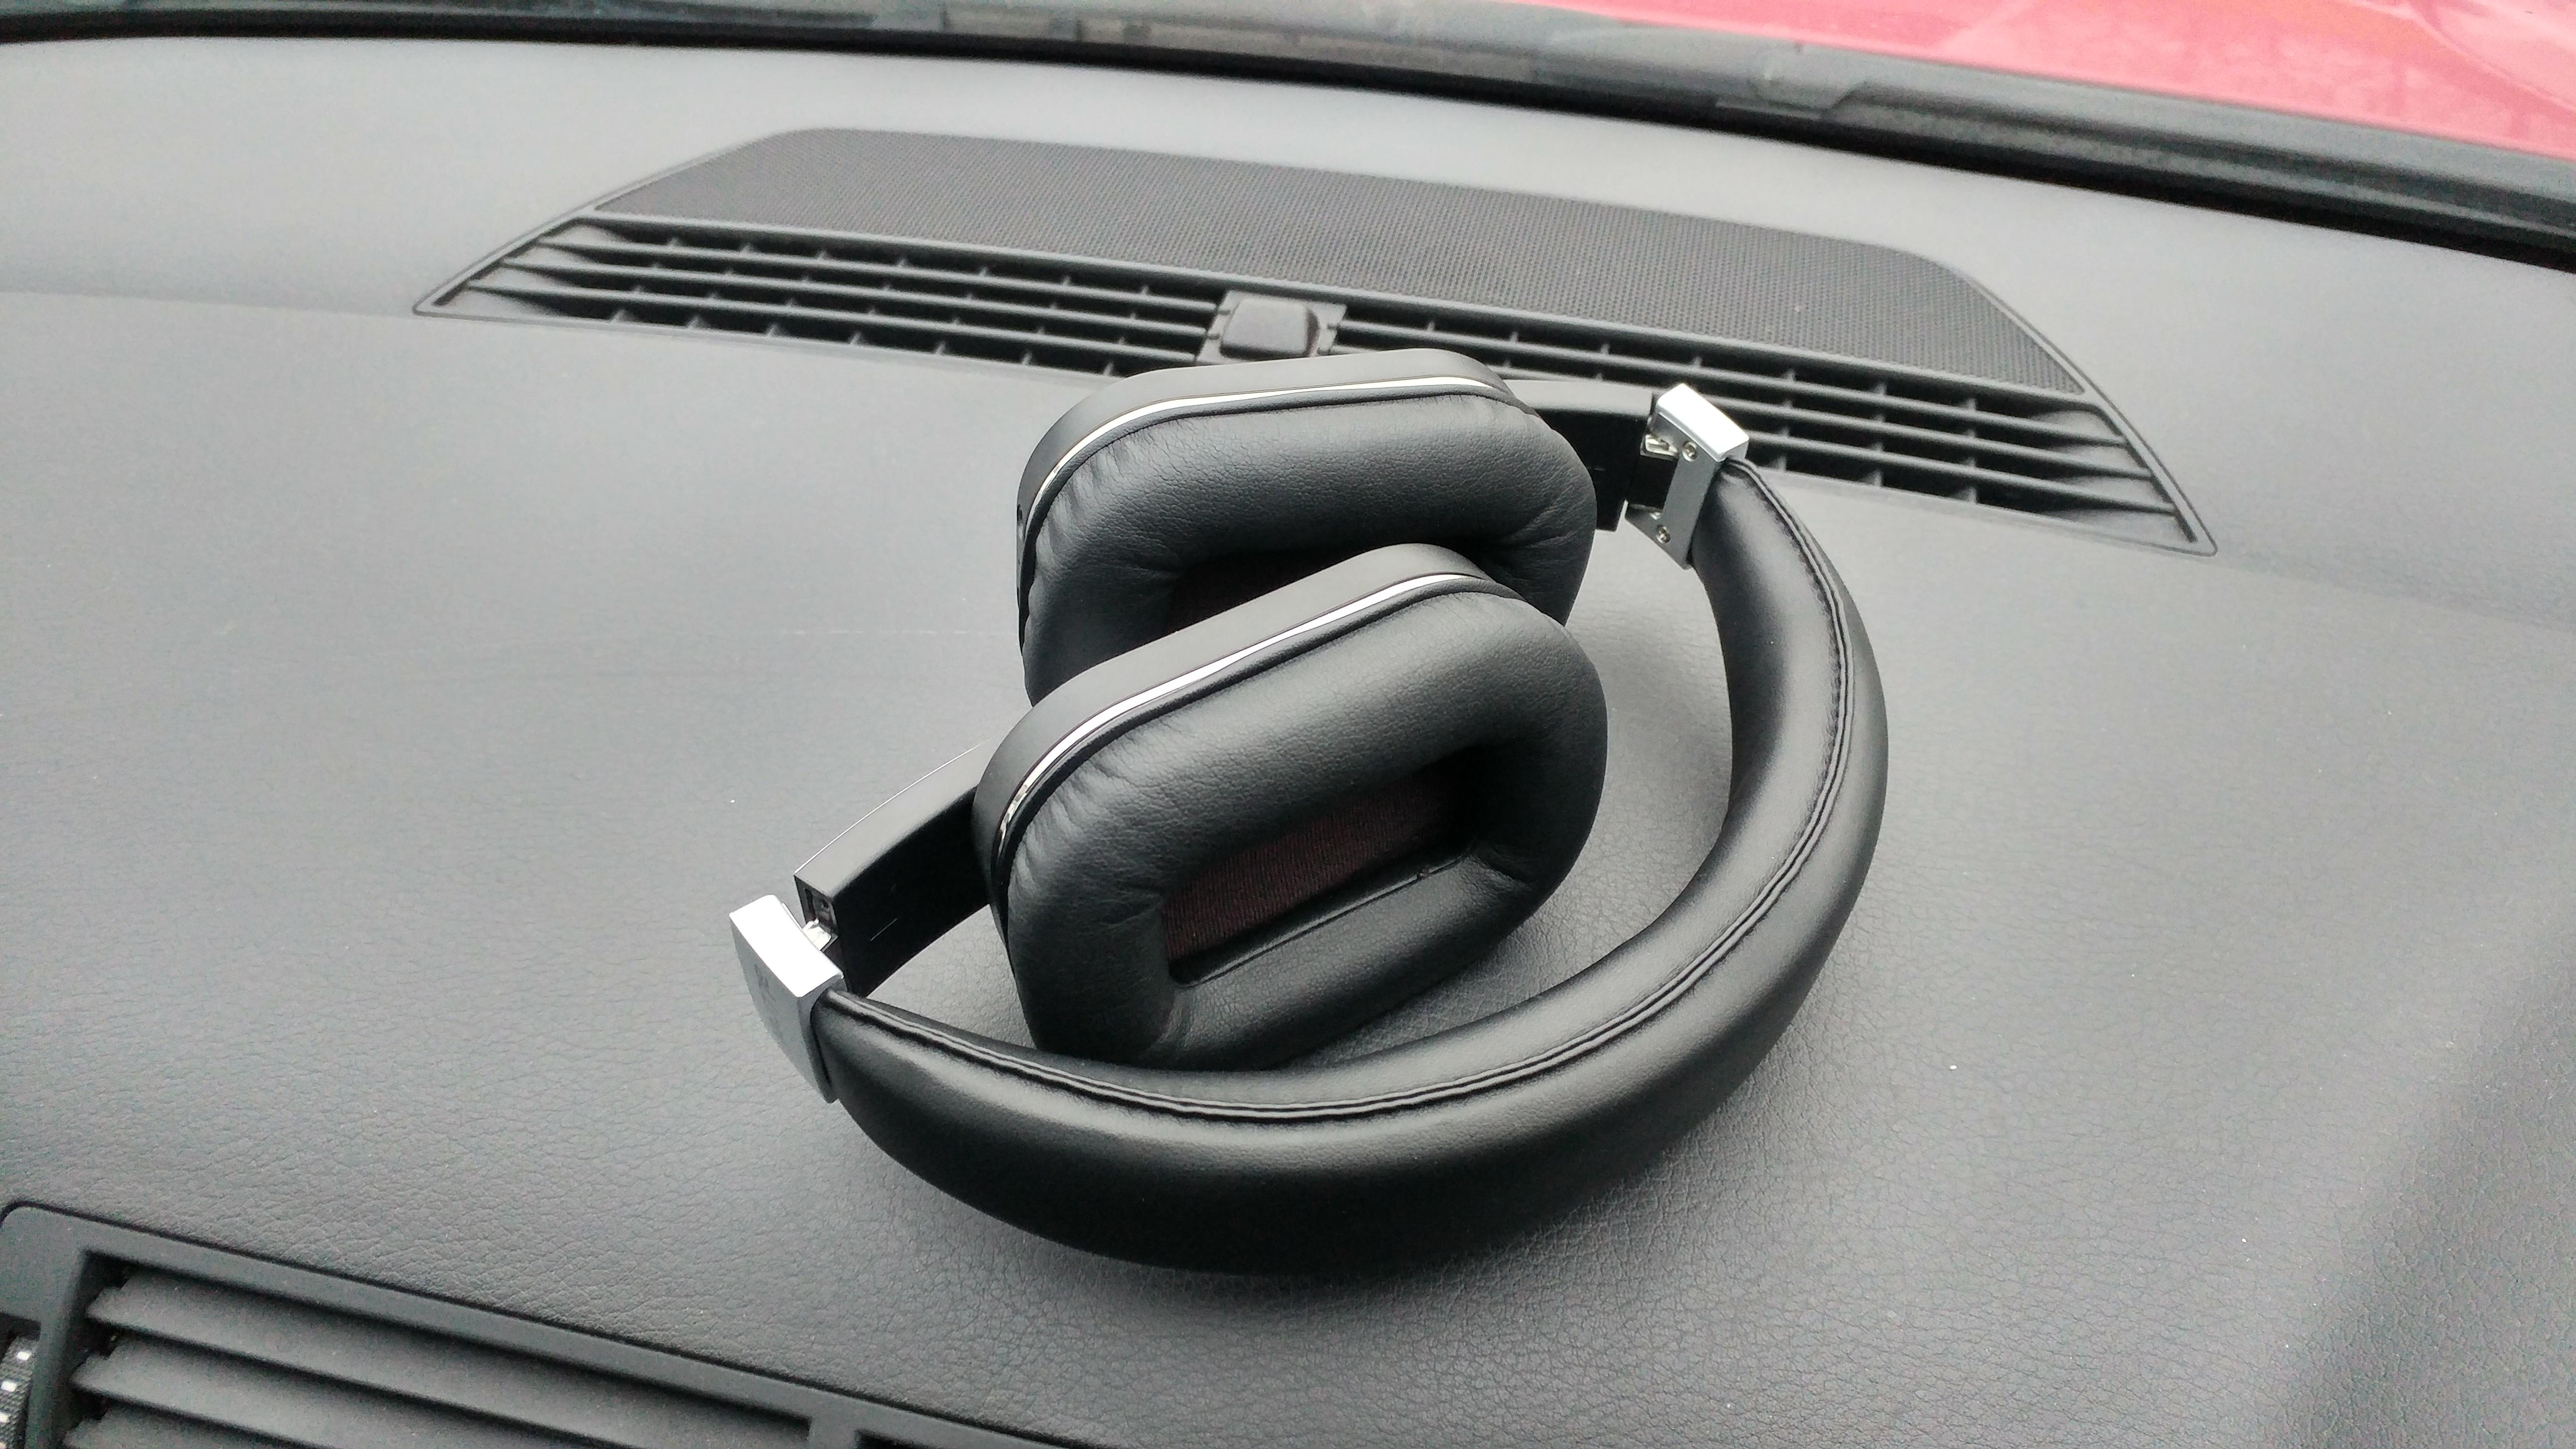 allreli f5 bluetooth headphones review coolsmartphone. Black Bedroom Furniture Sets. Home Design Ideas